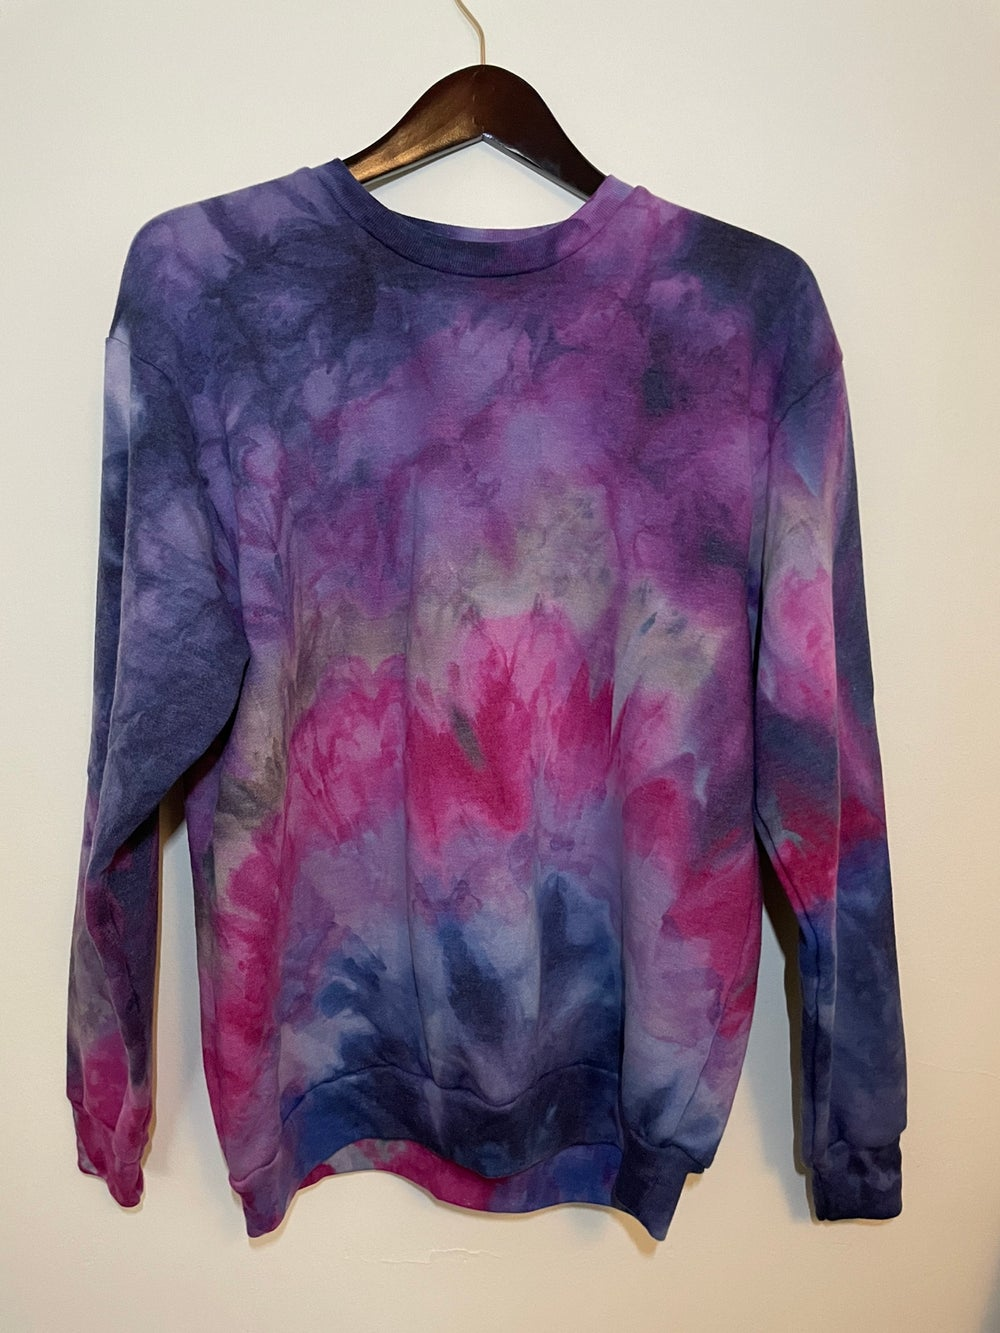 Tie-Dye Sweatshirt #3 - Large